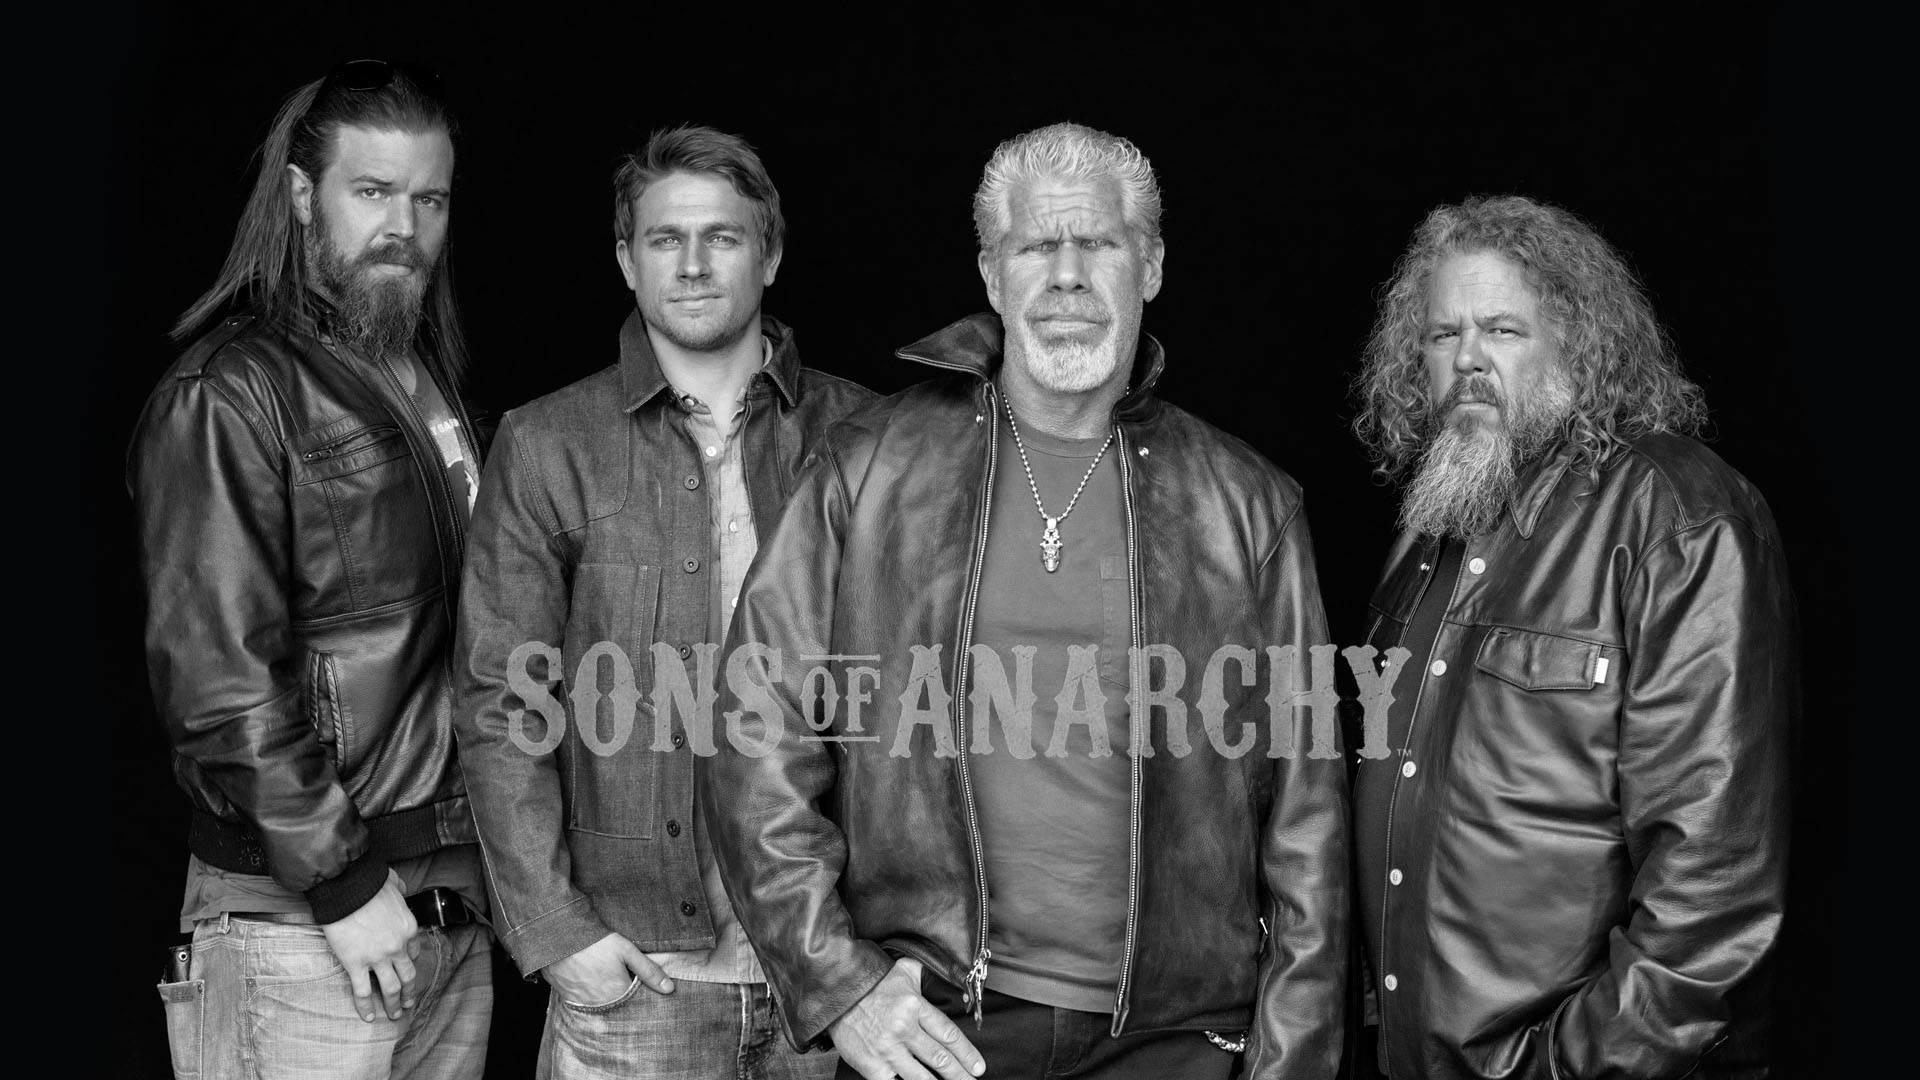 Sons of Anarchy Ryan Hurst, Charlie Hunnam, Ron Perlman Mark Boone Junior